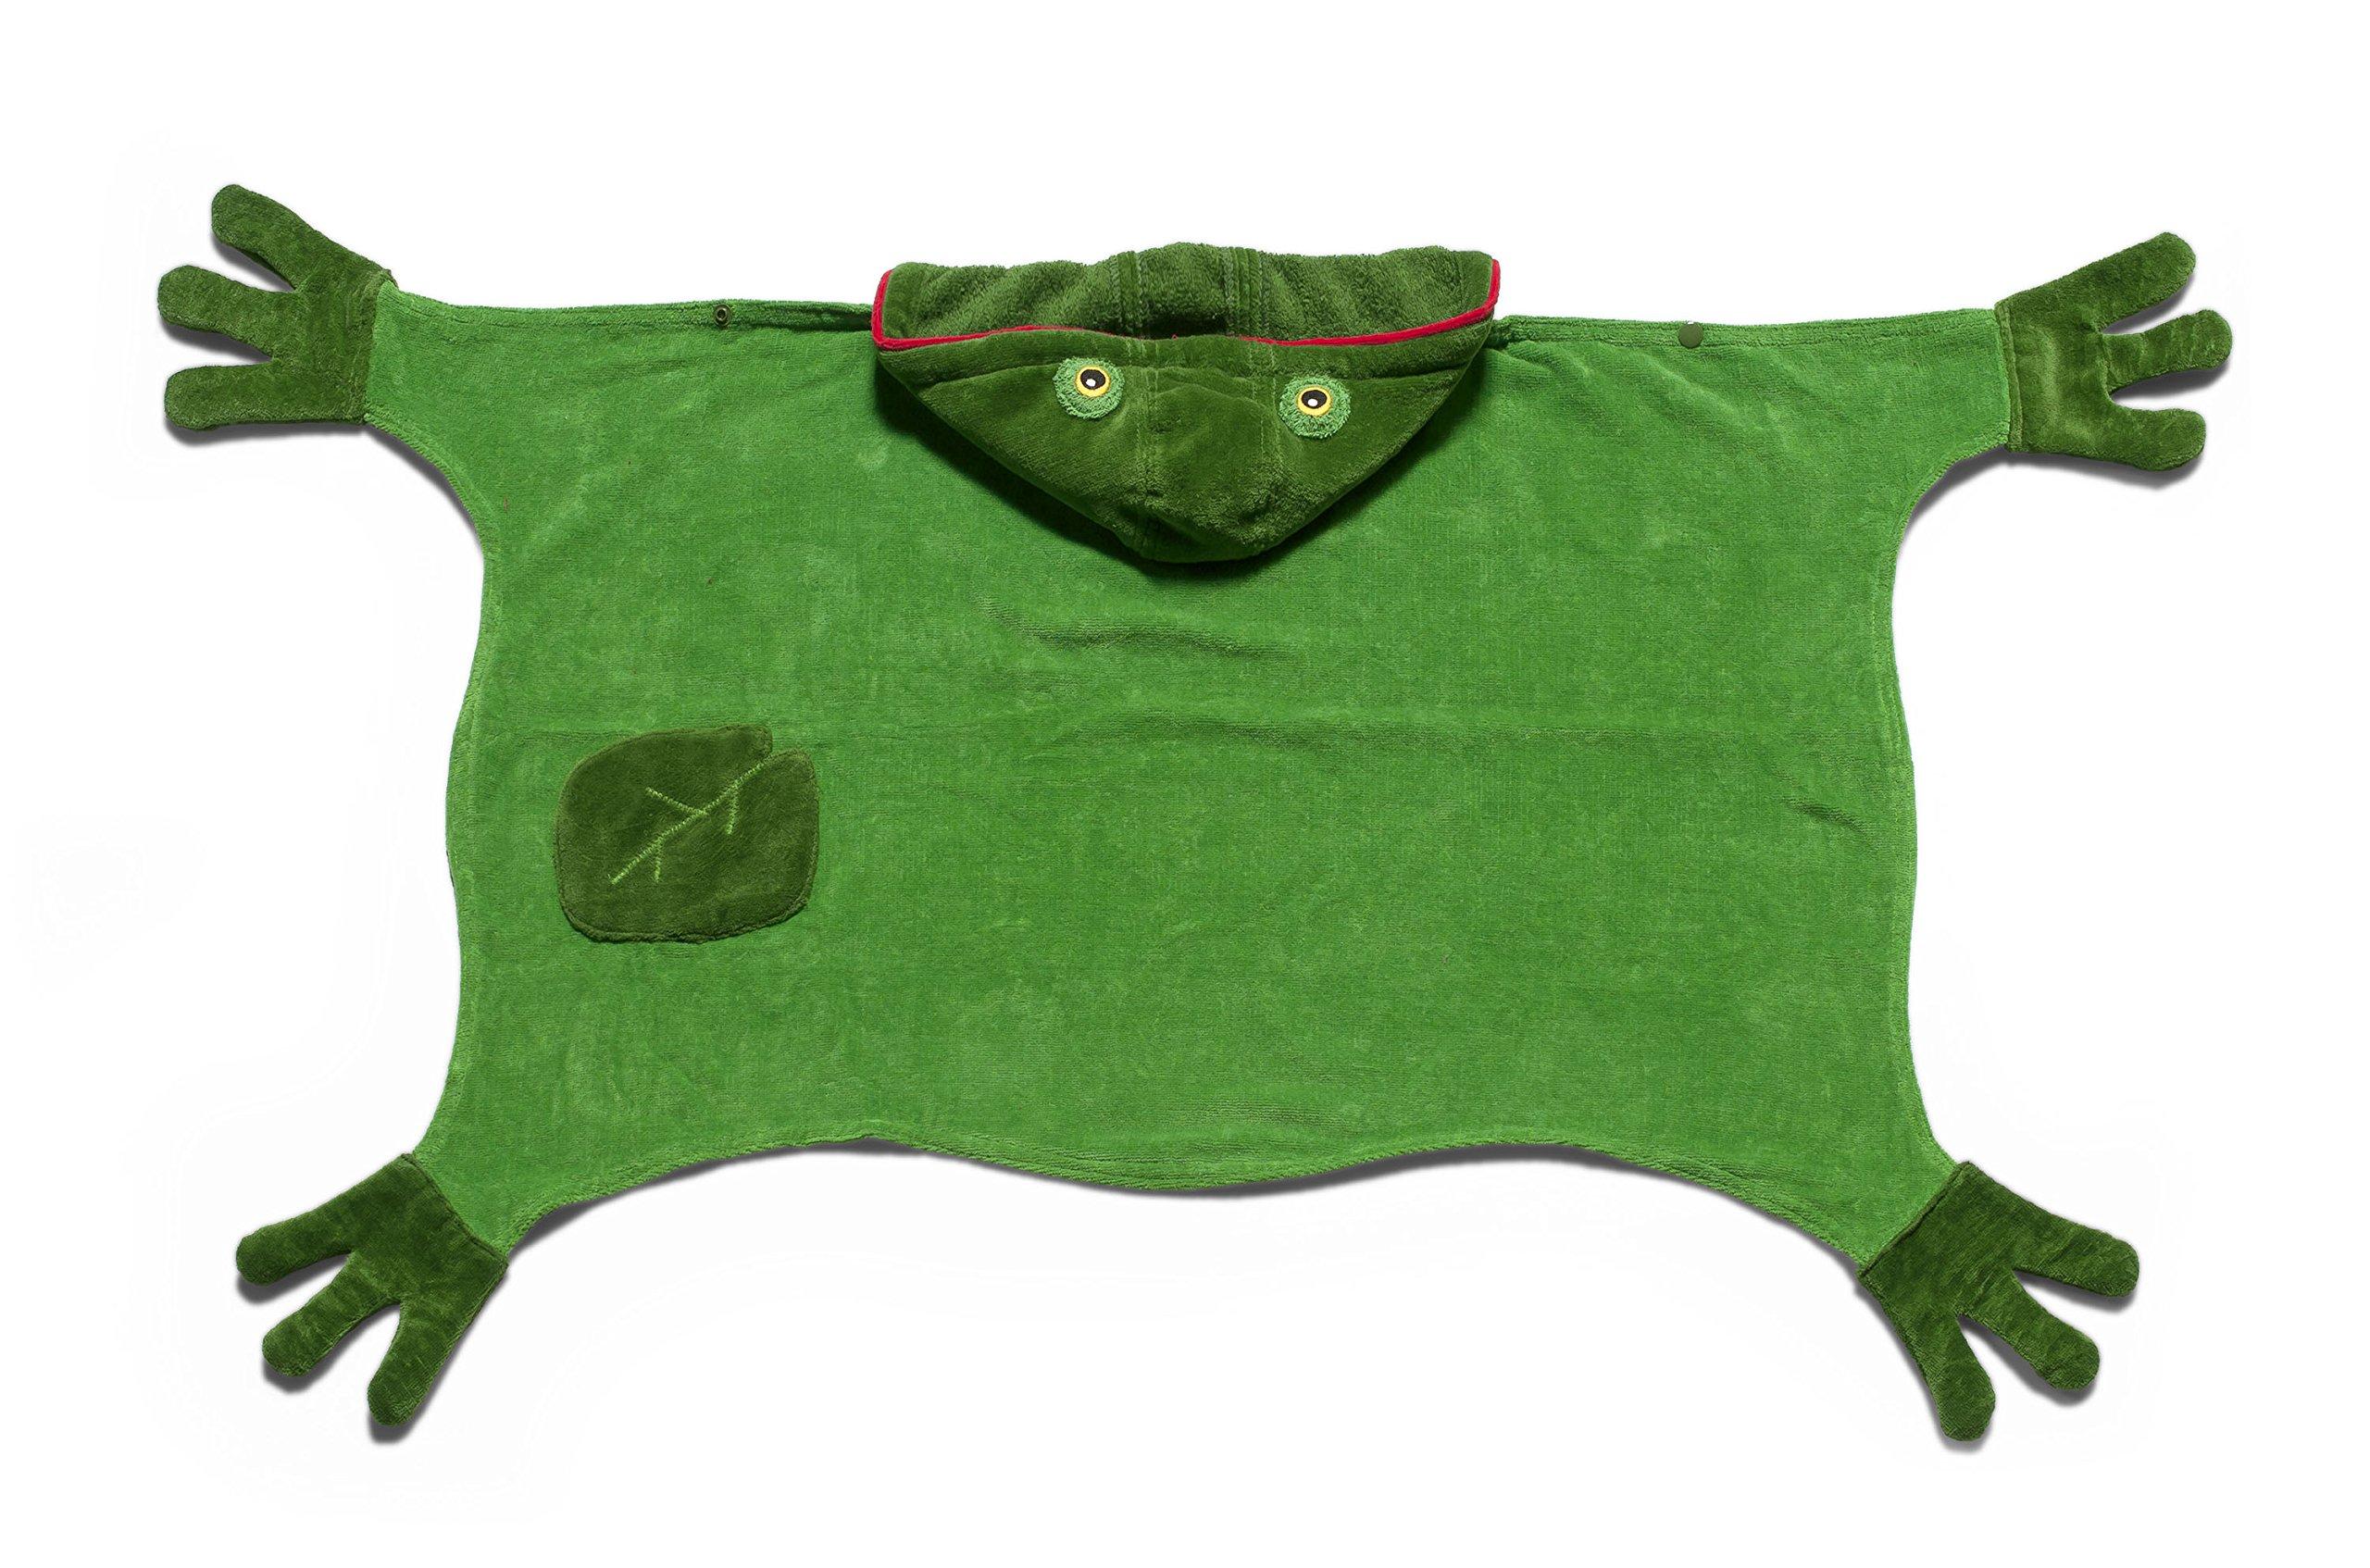 Kidorable Kids Frog Towel, Size Medium, Green Hooded Towel for Bath, Beach or Pool, 100% Cotton Kid's Towel, Machine Washable